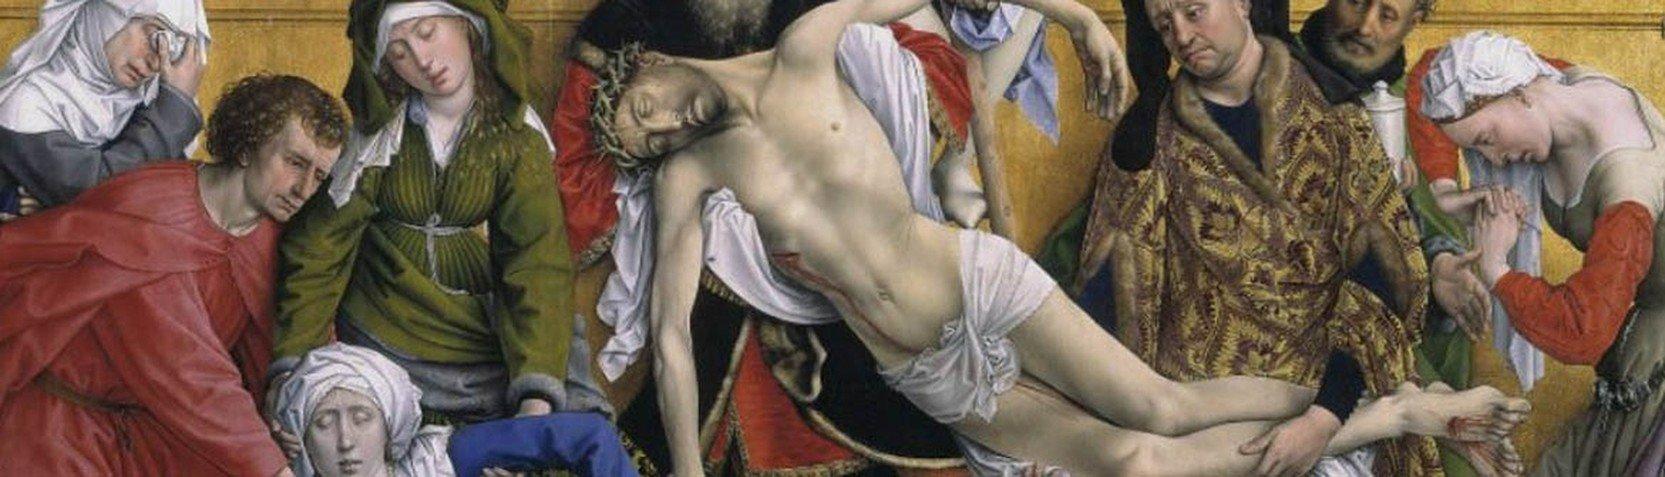 Kollektioner - Religiöst måleri